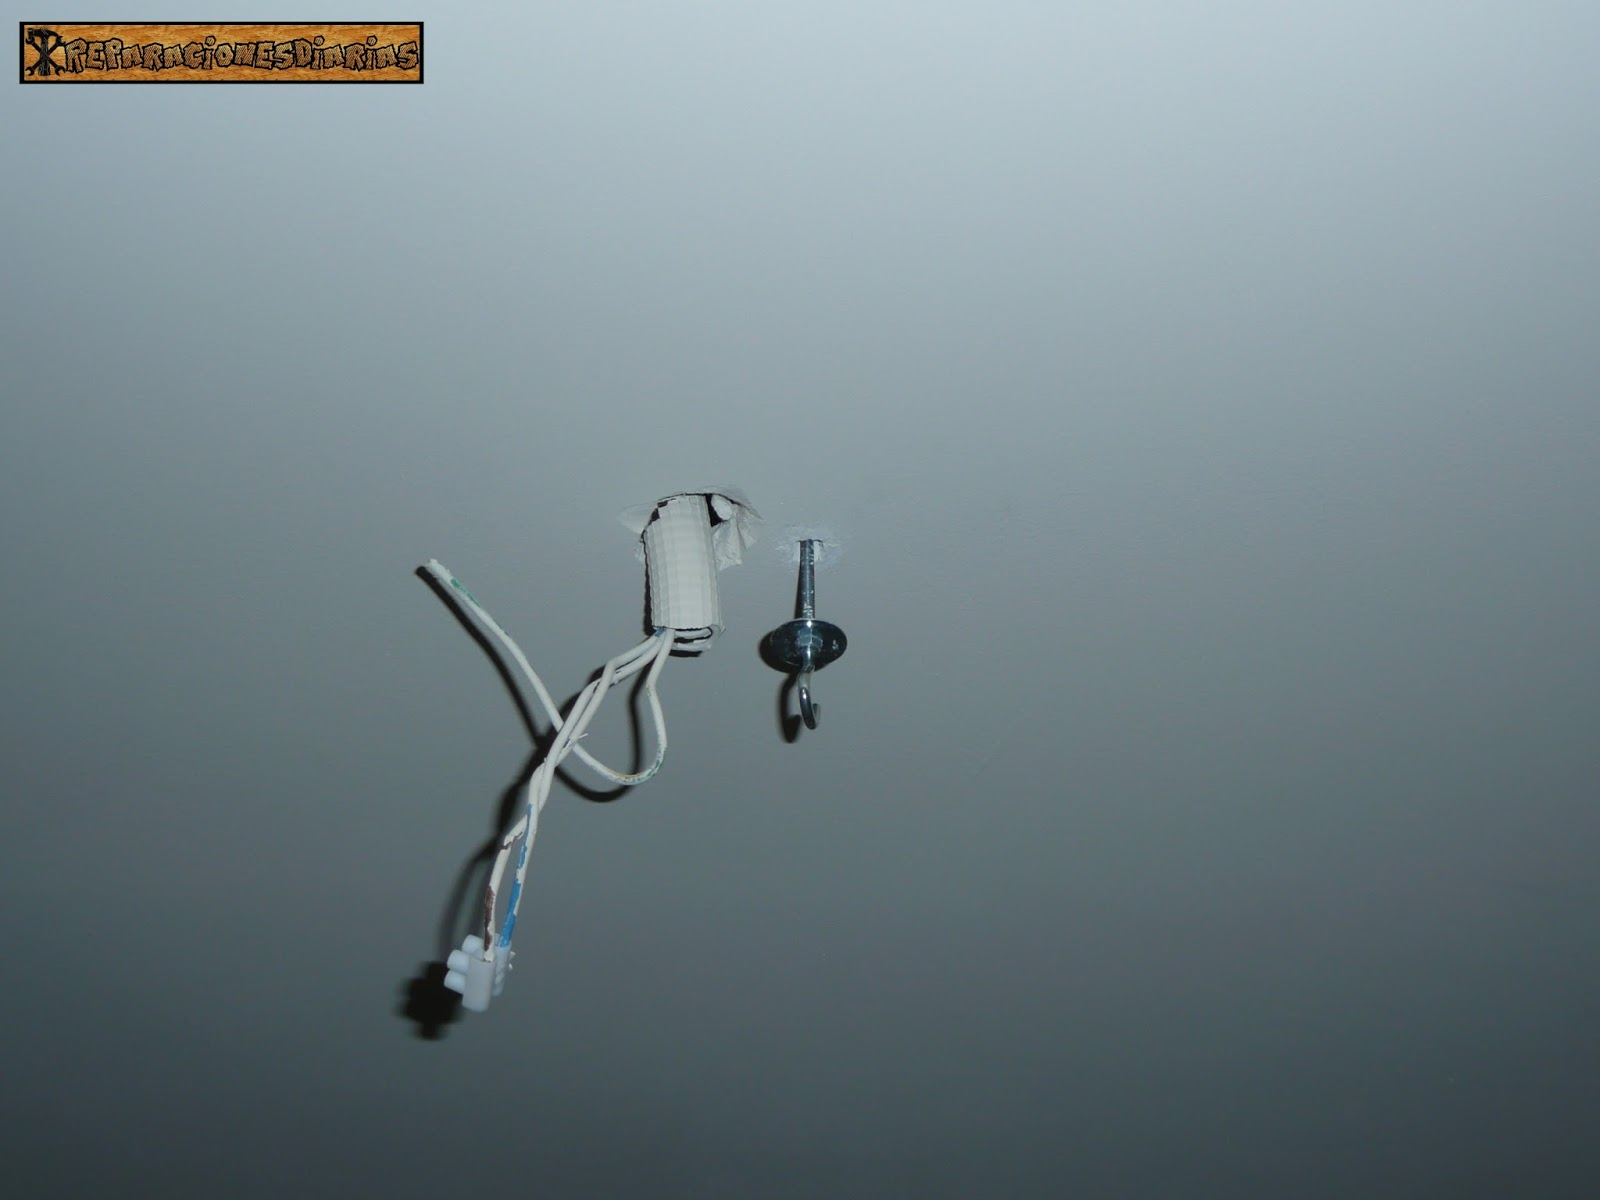 Colgar lampara sin taladrar finest sin agujeros de for Perchero pared sin agujeros